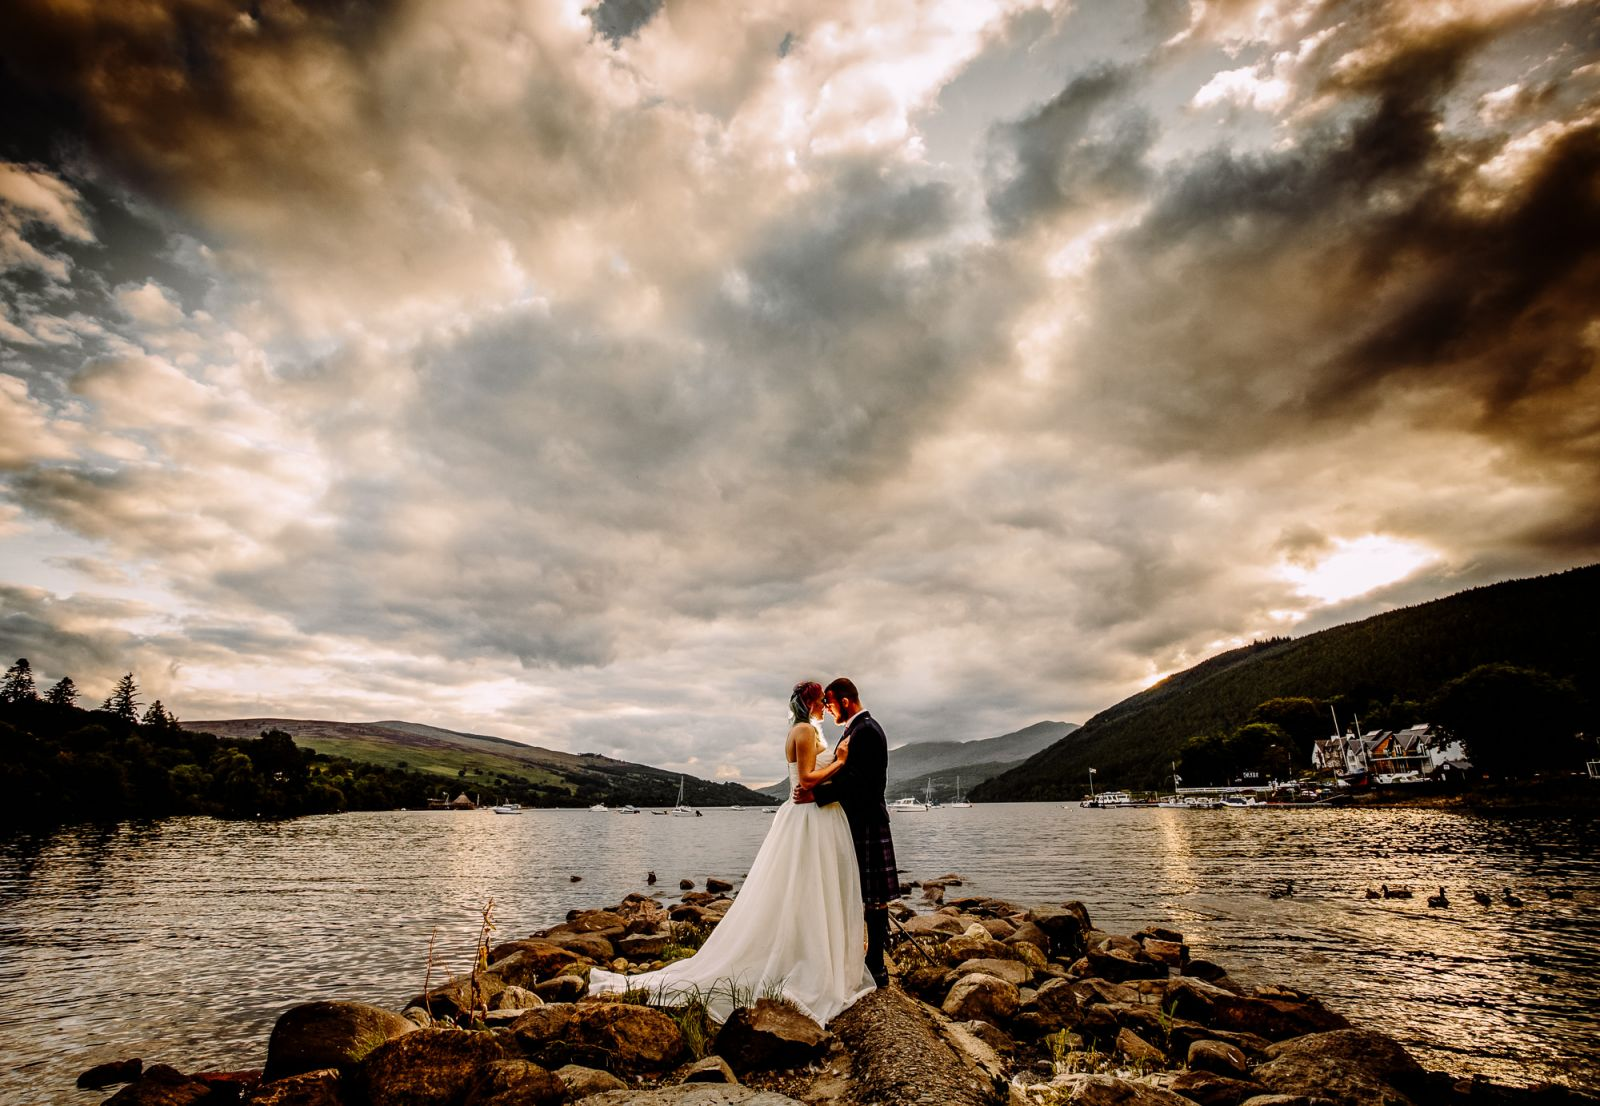 yorkshire wedding photographer - creative landscape wedding shot